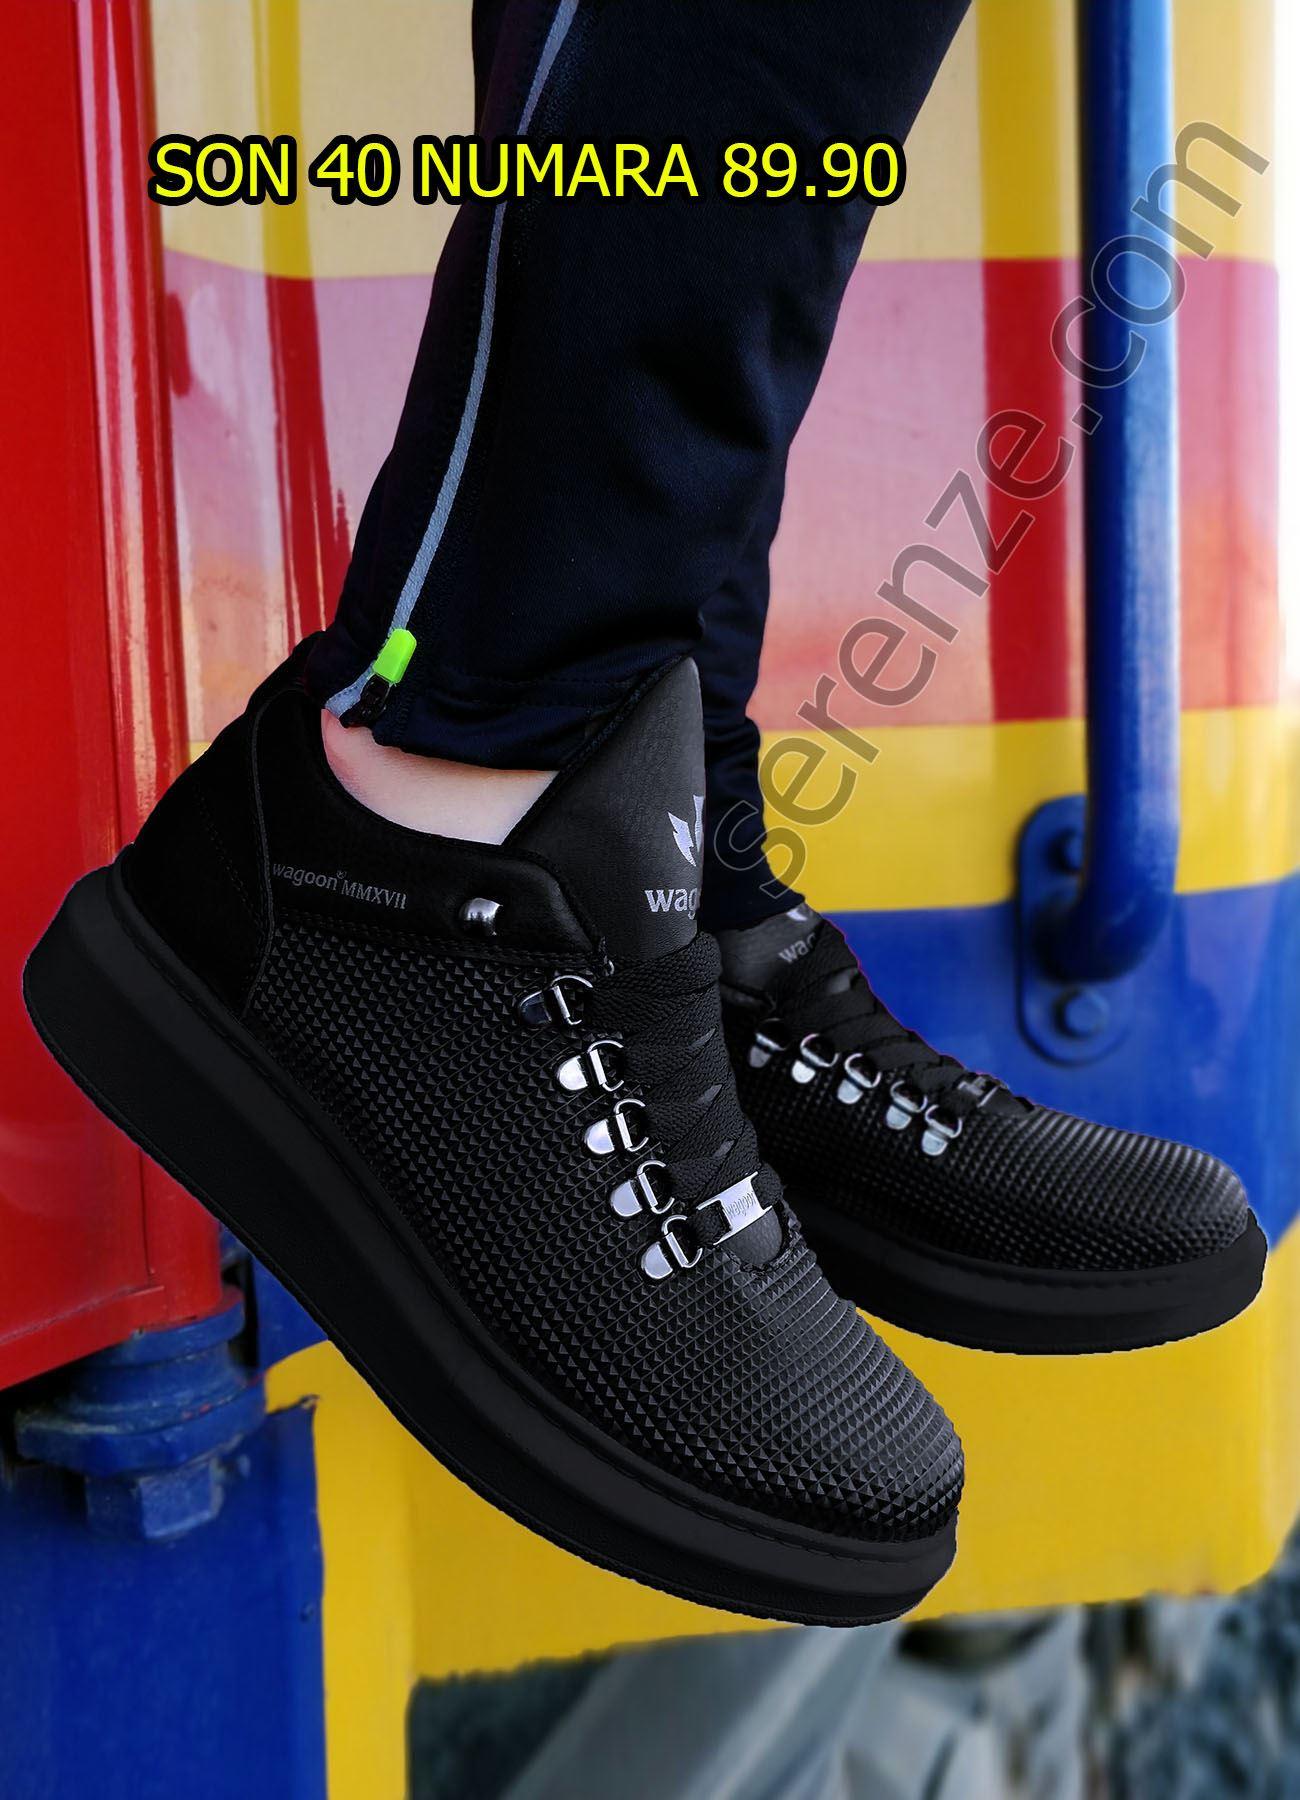 Piramit Doku Siyah Erkek Spor Ayakkabı